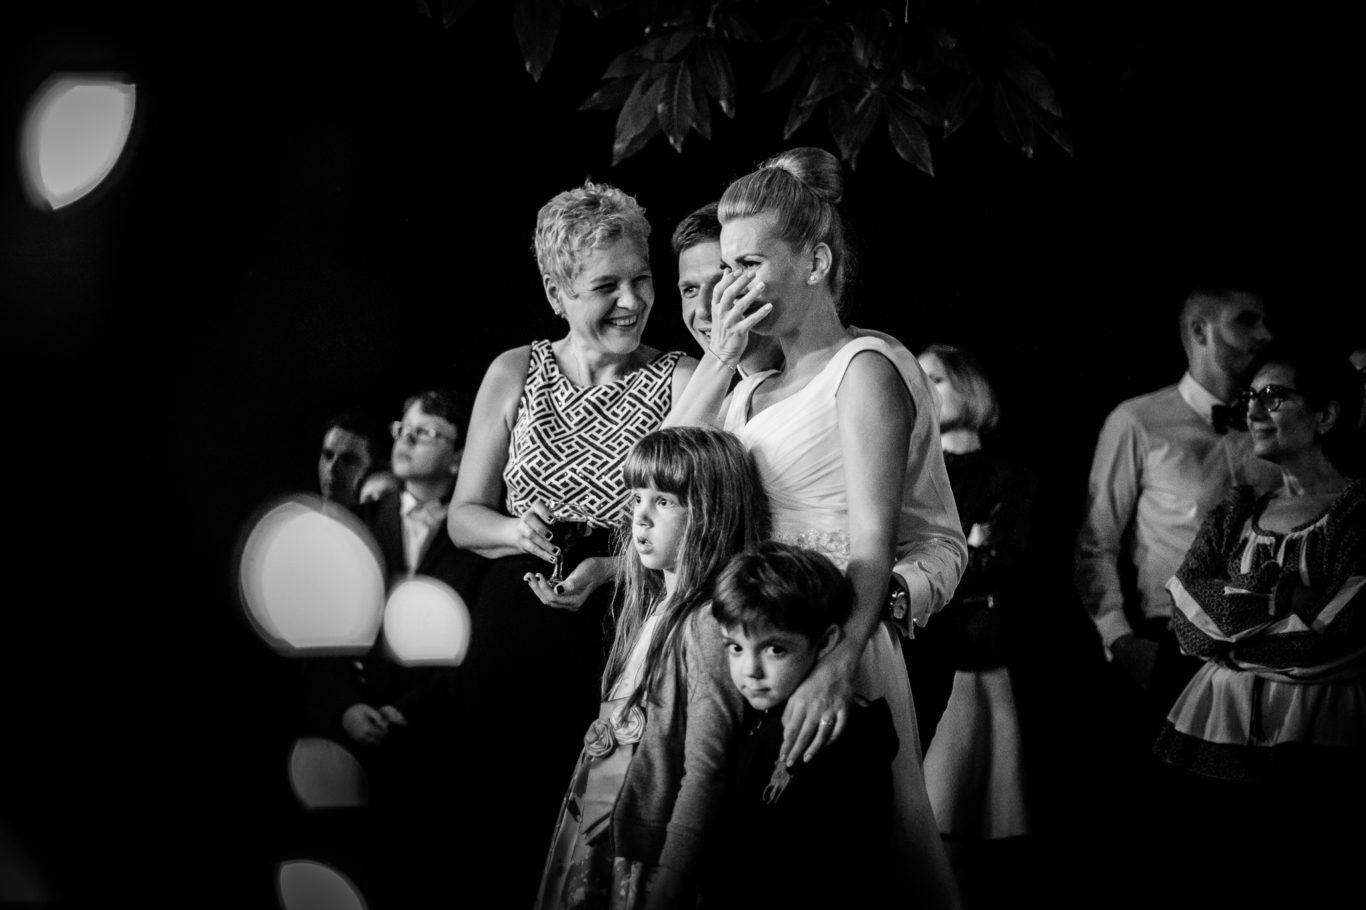 0624-fotoreportaj-nunta-conacul-maldar-cristina-stefan-fotograf-ciprian-dumitrescu-cd2_3937